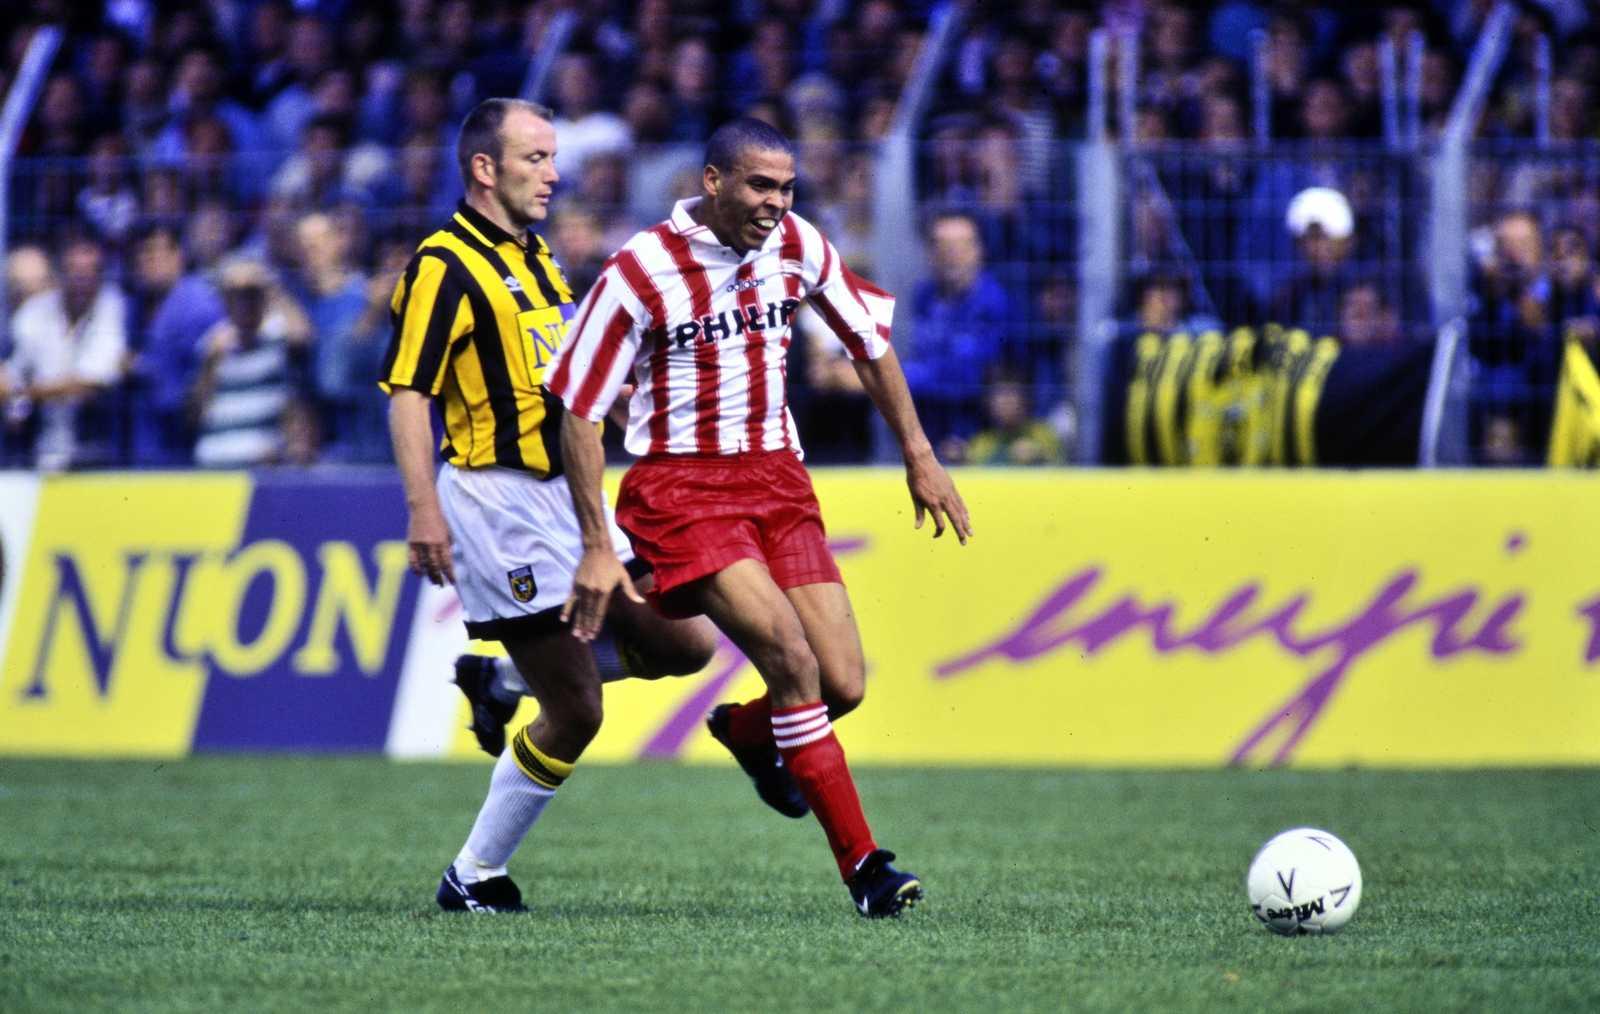 PSV Eindhoven 17-18 Home Kit Revealed - Footy Headlines